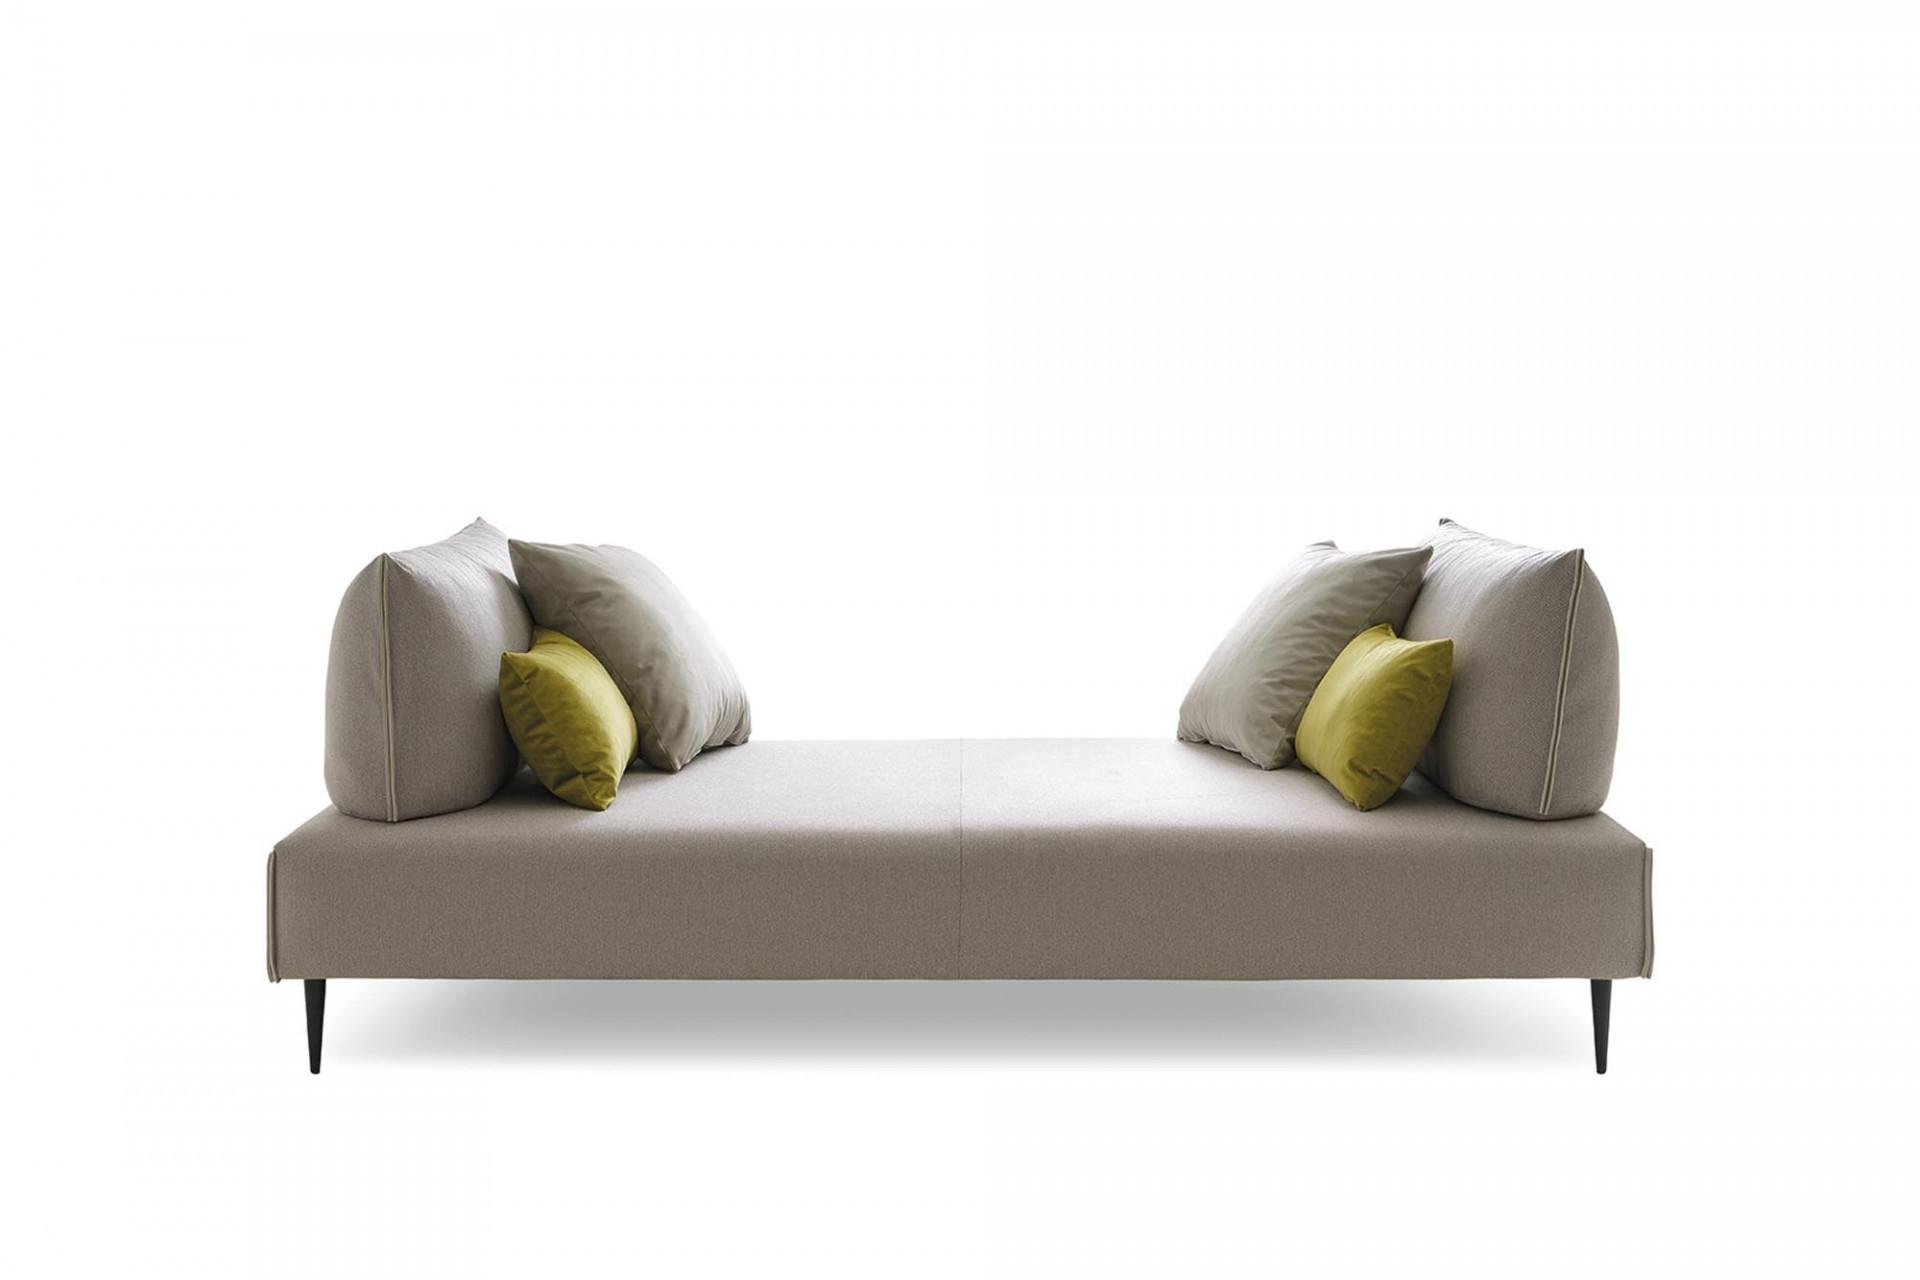 Canapea fixa 2 locuri, tapitata cu stofa, Bacio Grej, l187xA116xH83 cm imagine